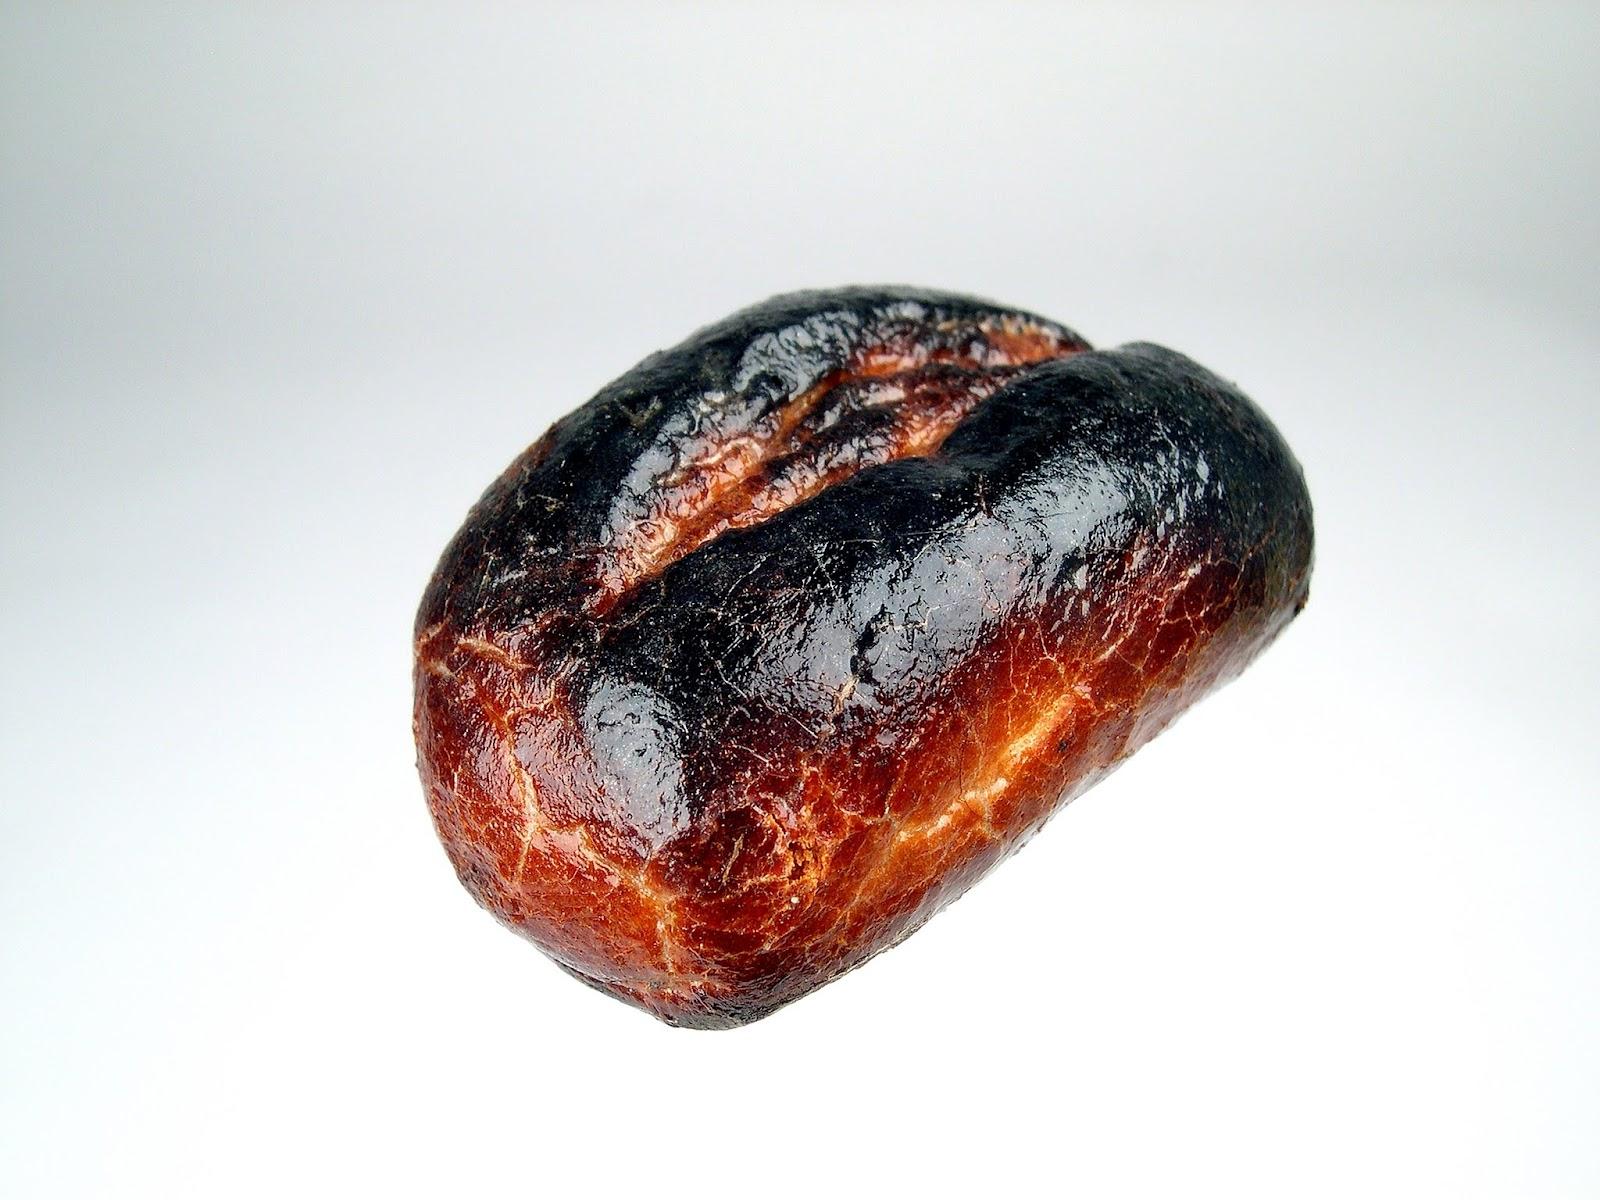 Burned Bread